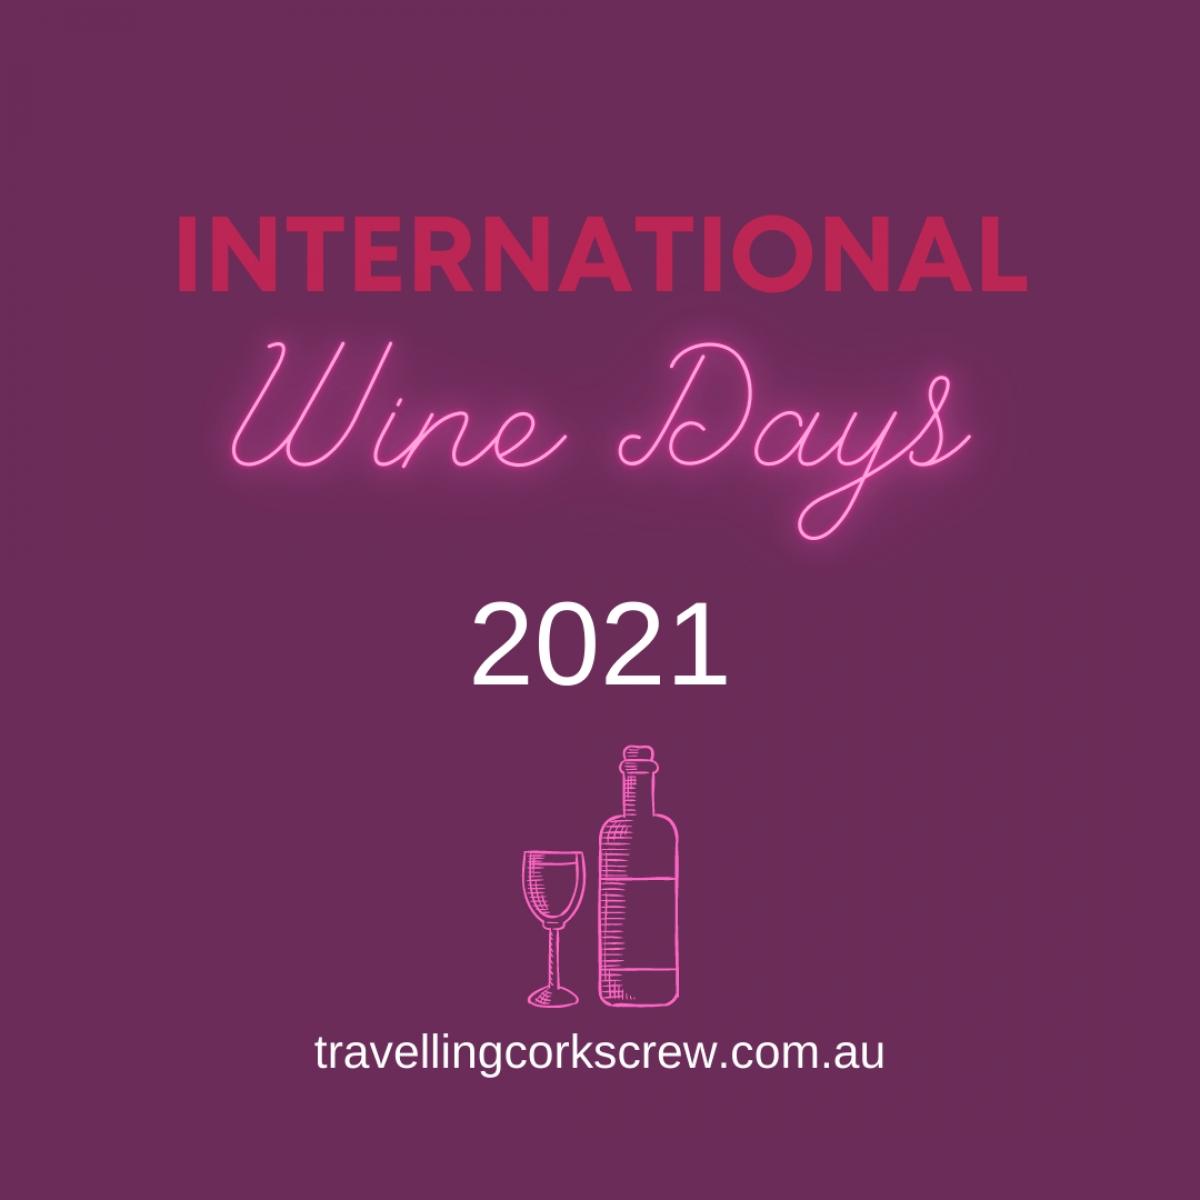 Full List Of Wine Holidays For 2021 | Travelling Corkscrew